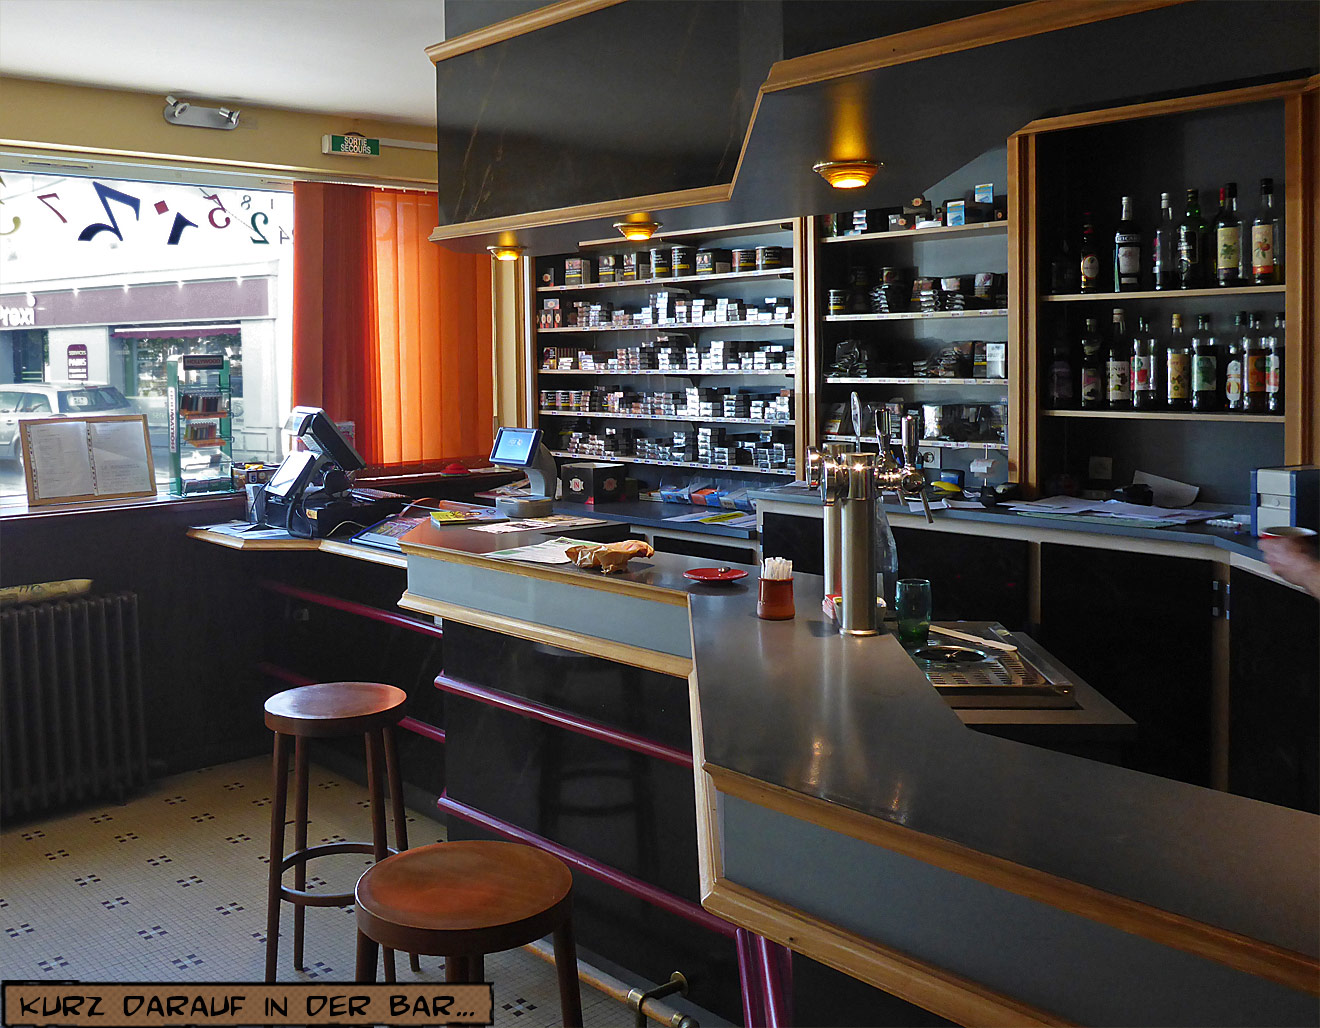 Restaurant Le Canastell